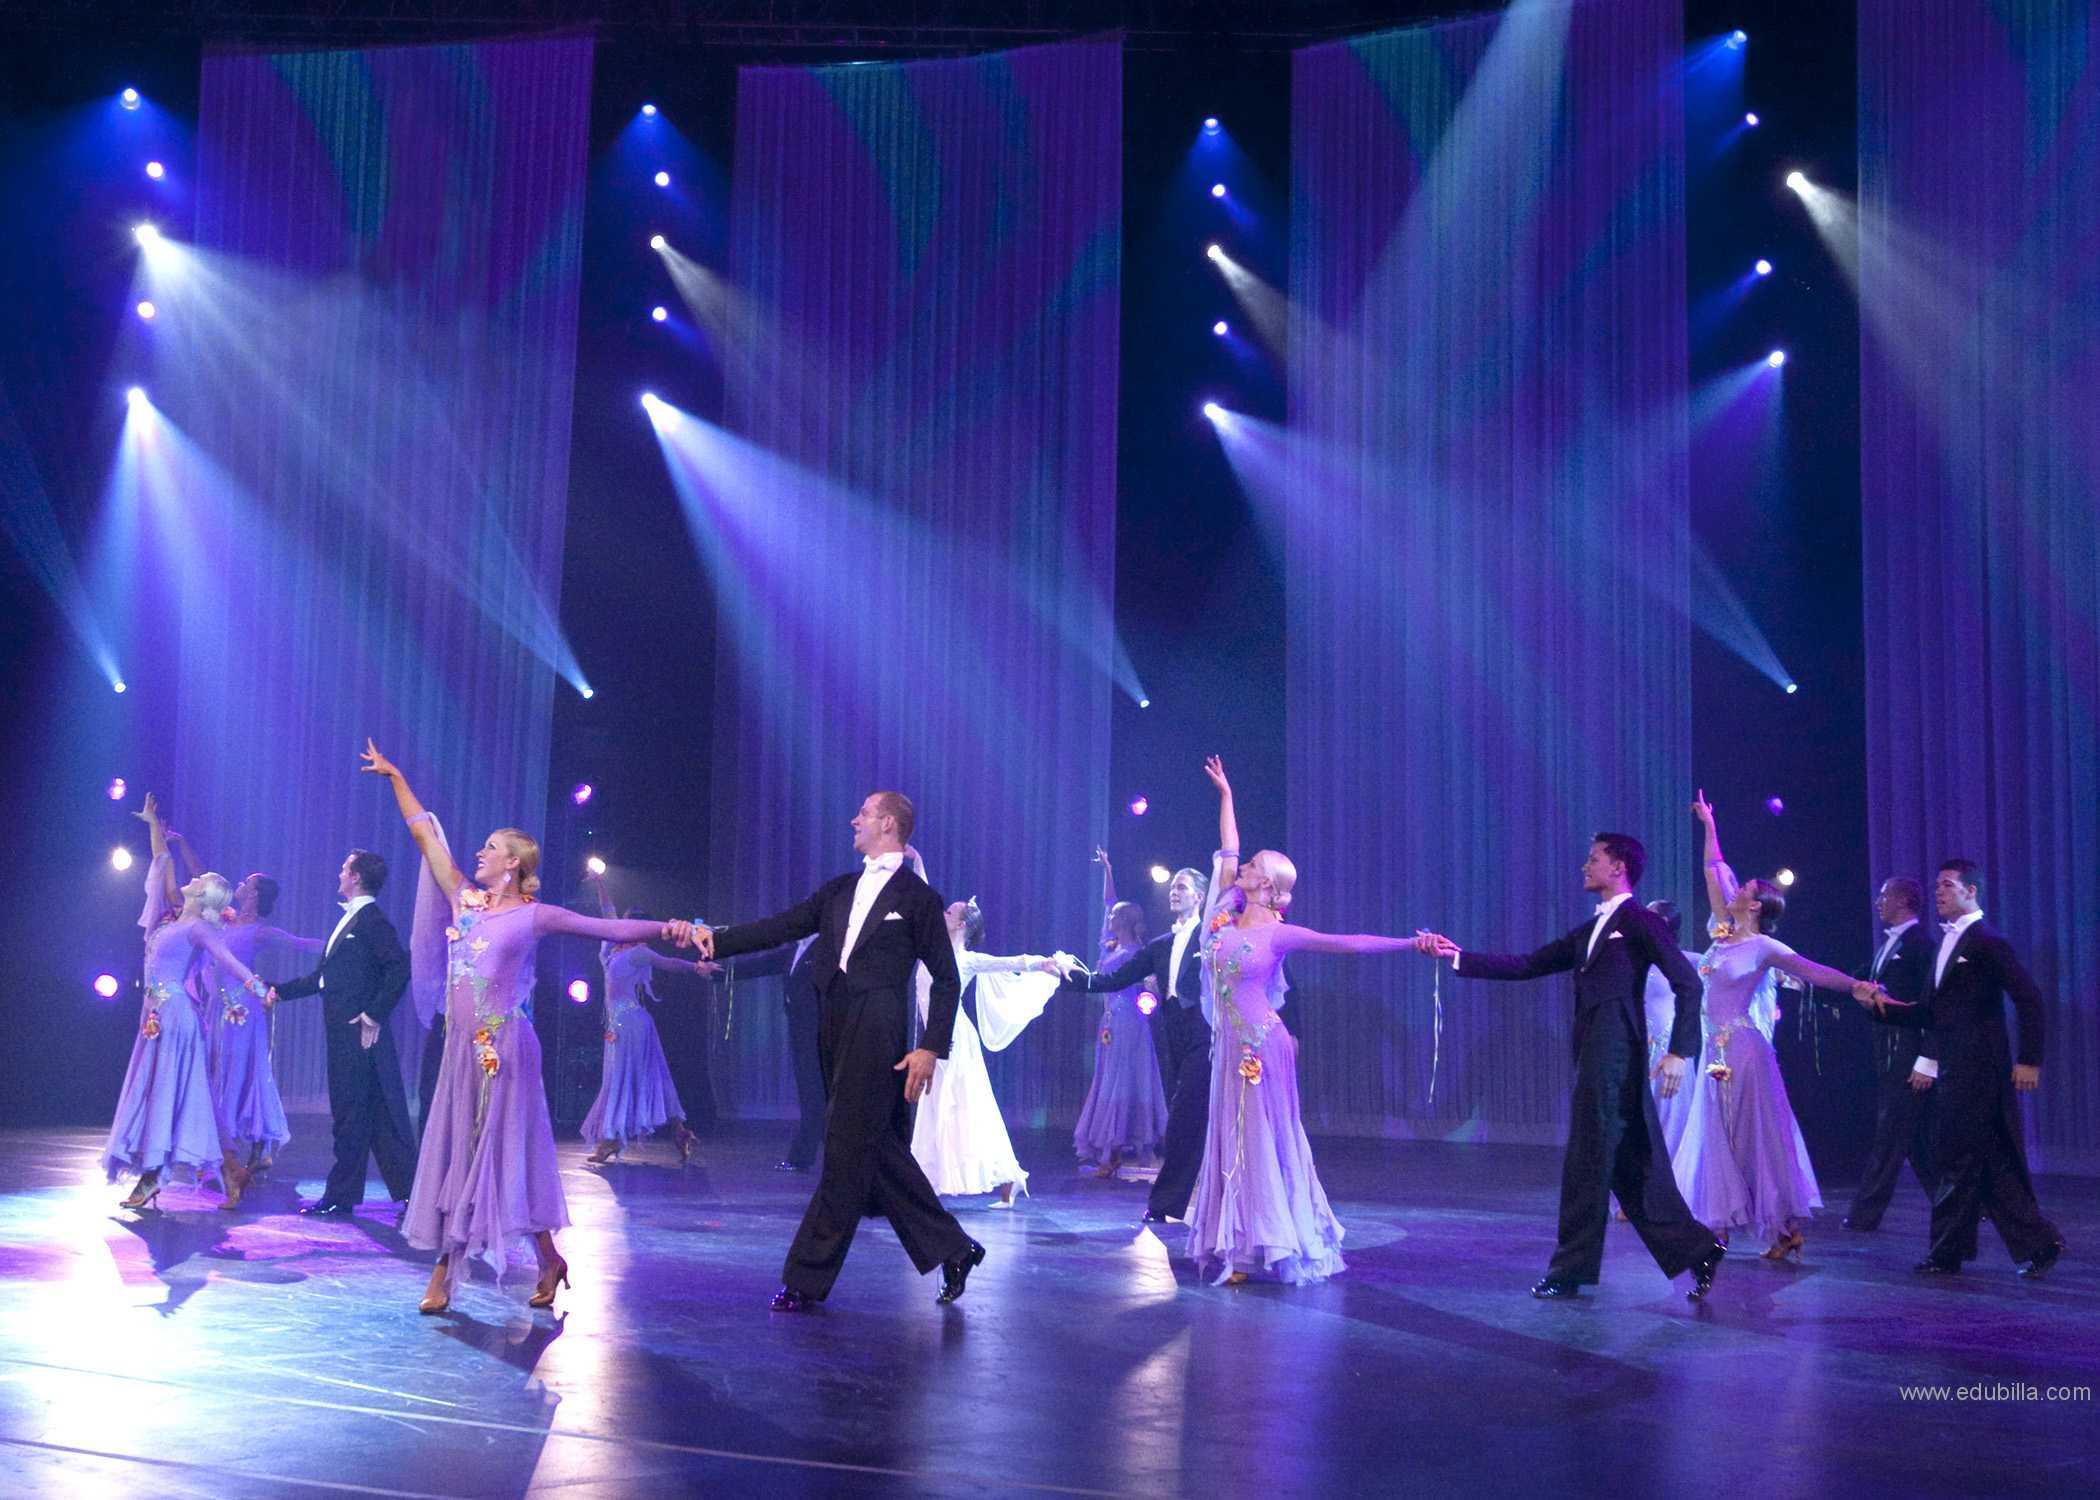 ballroomdance23.jpg